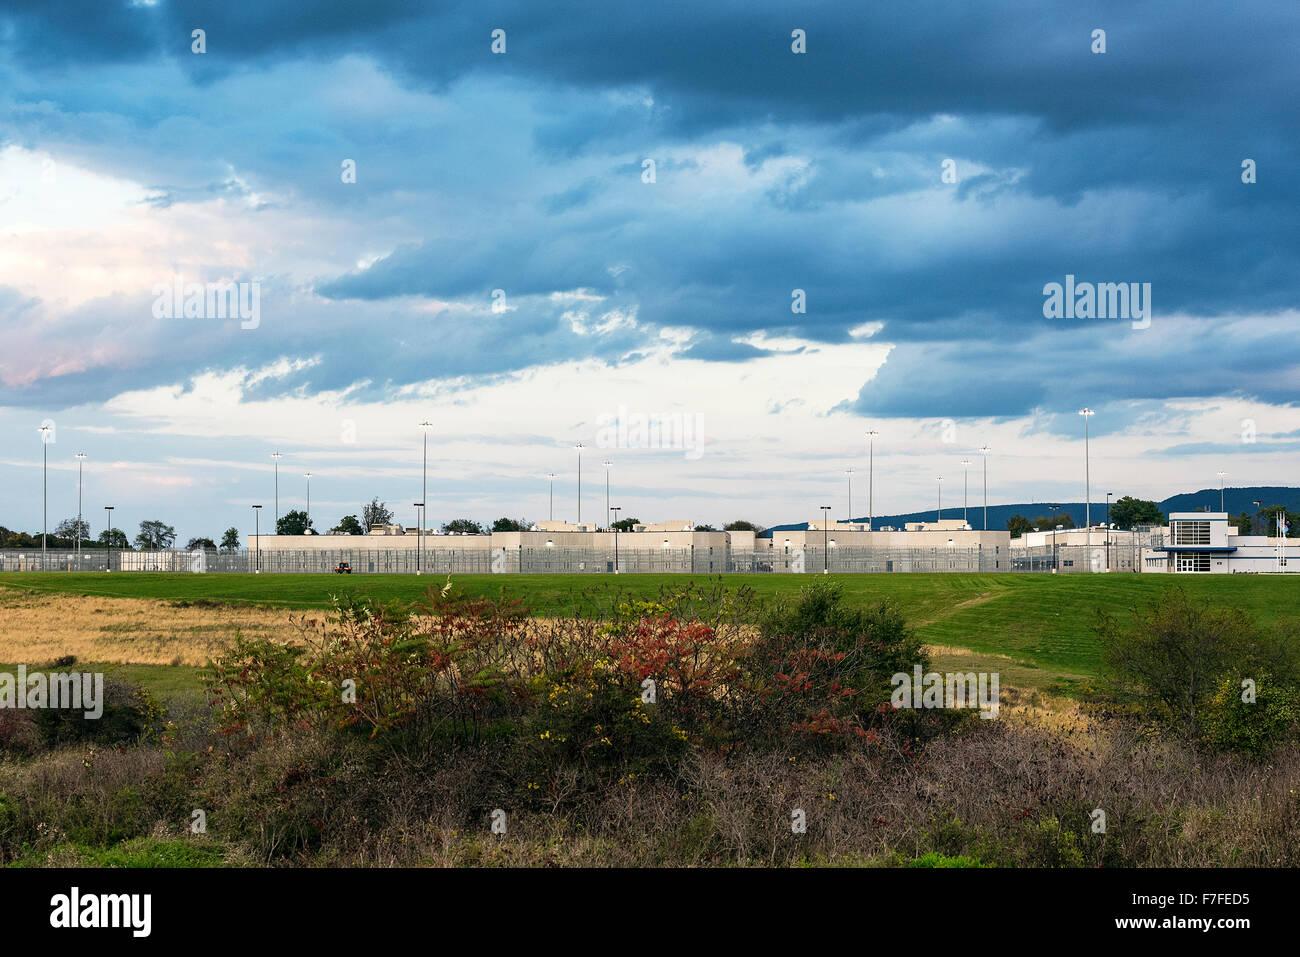 Rockview Prison, Benner Township, Pennsylvania, USA - Stock Image